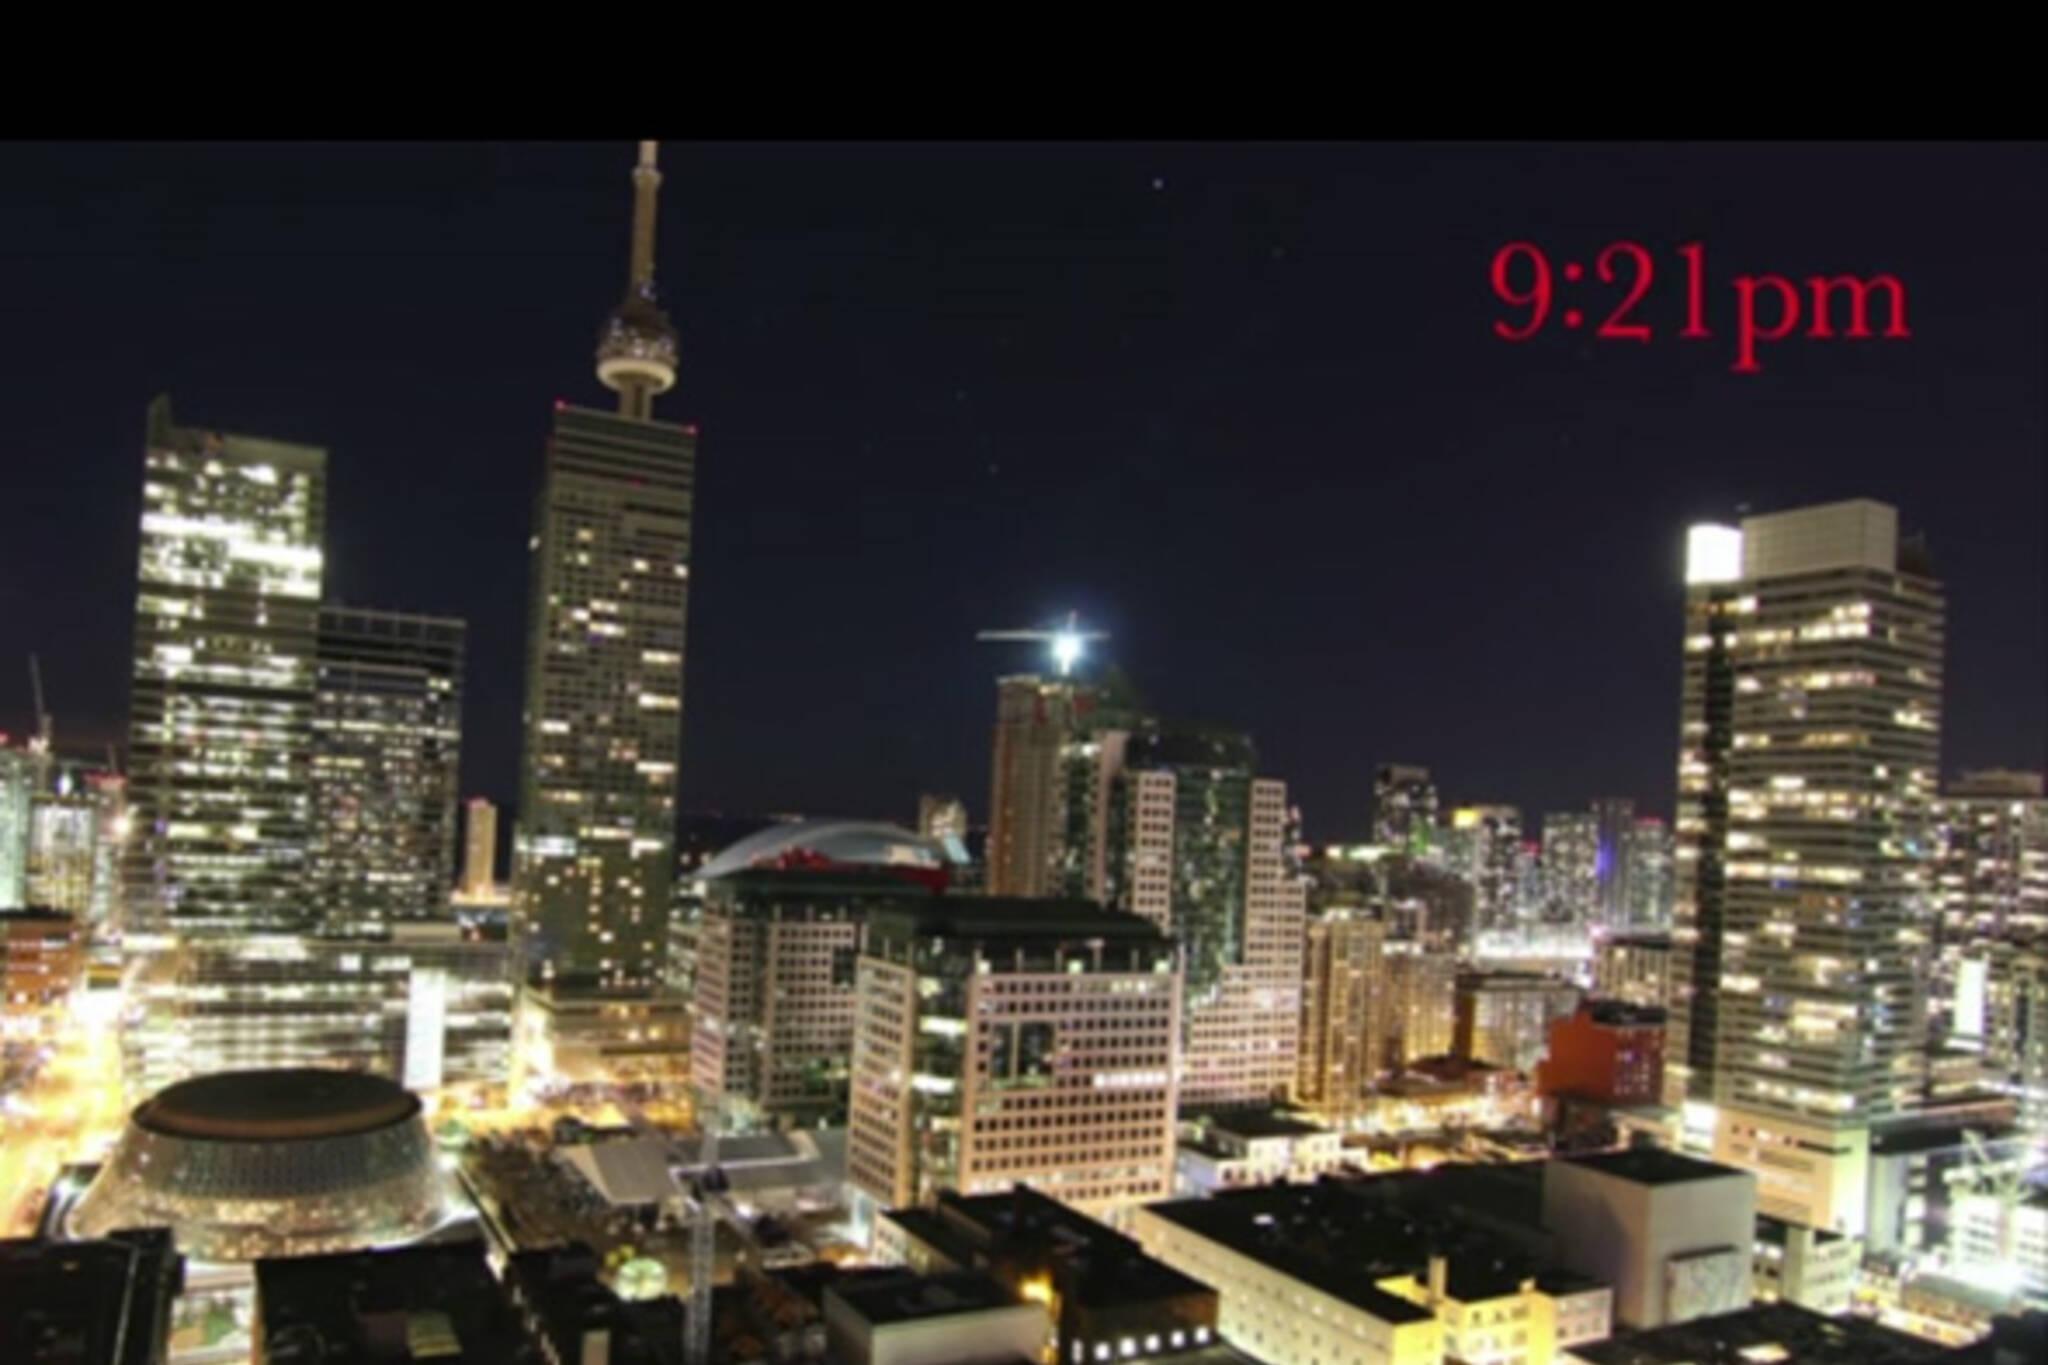 Earth Hour Toronto 2013